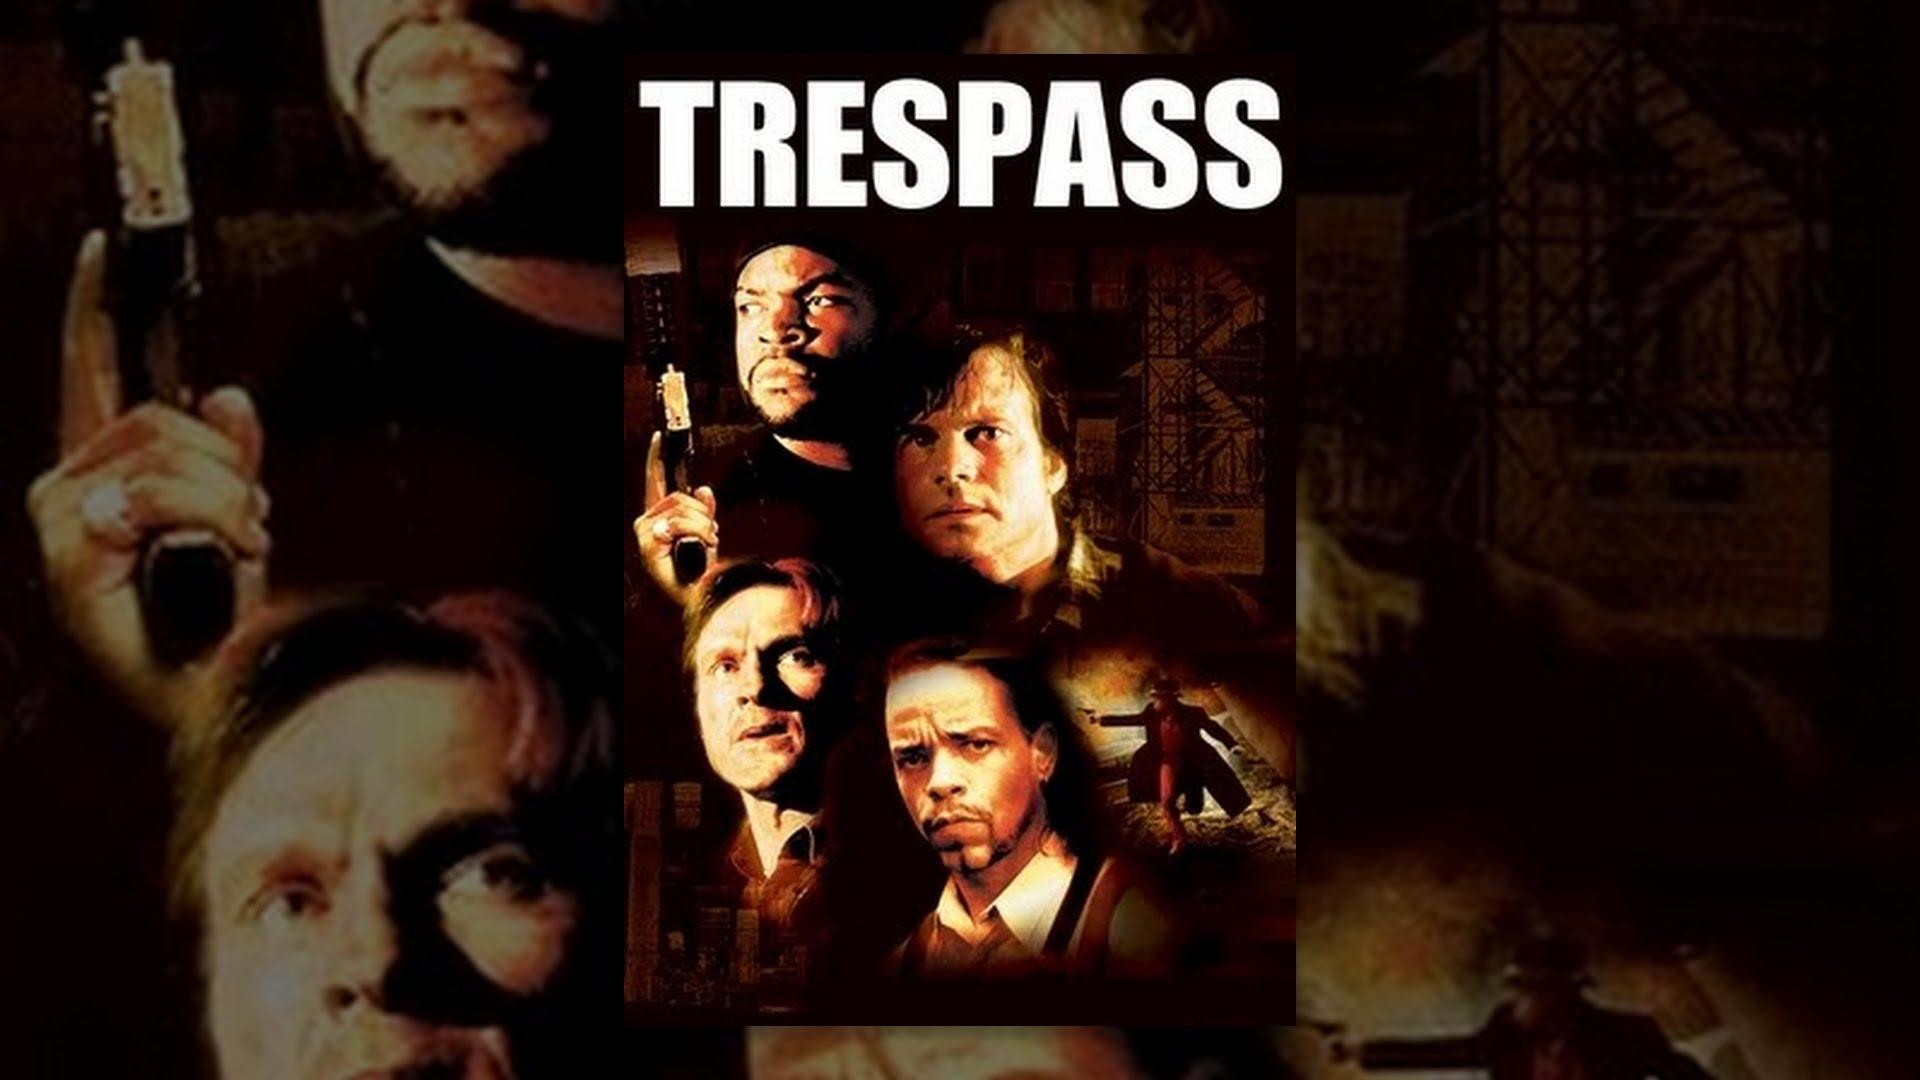 Trespass Film